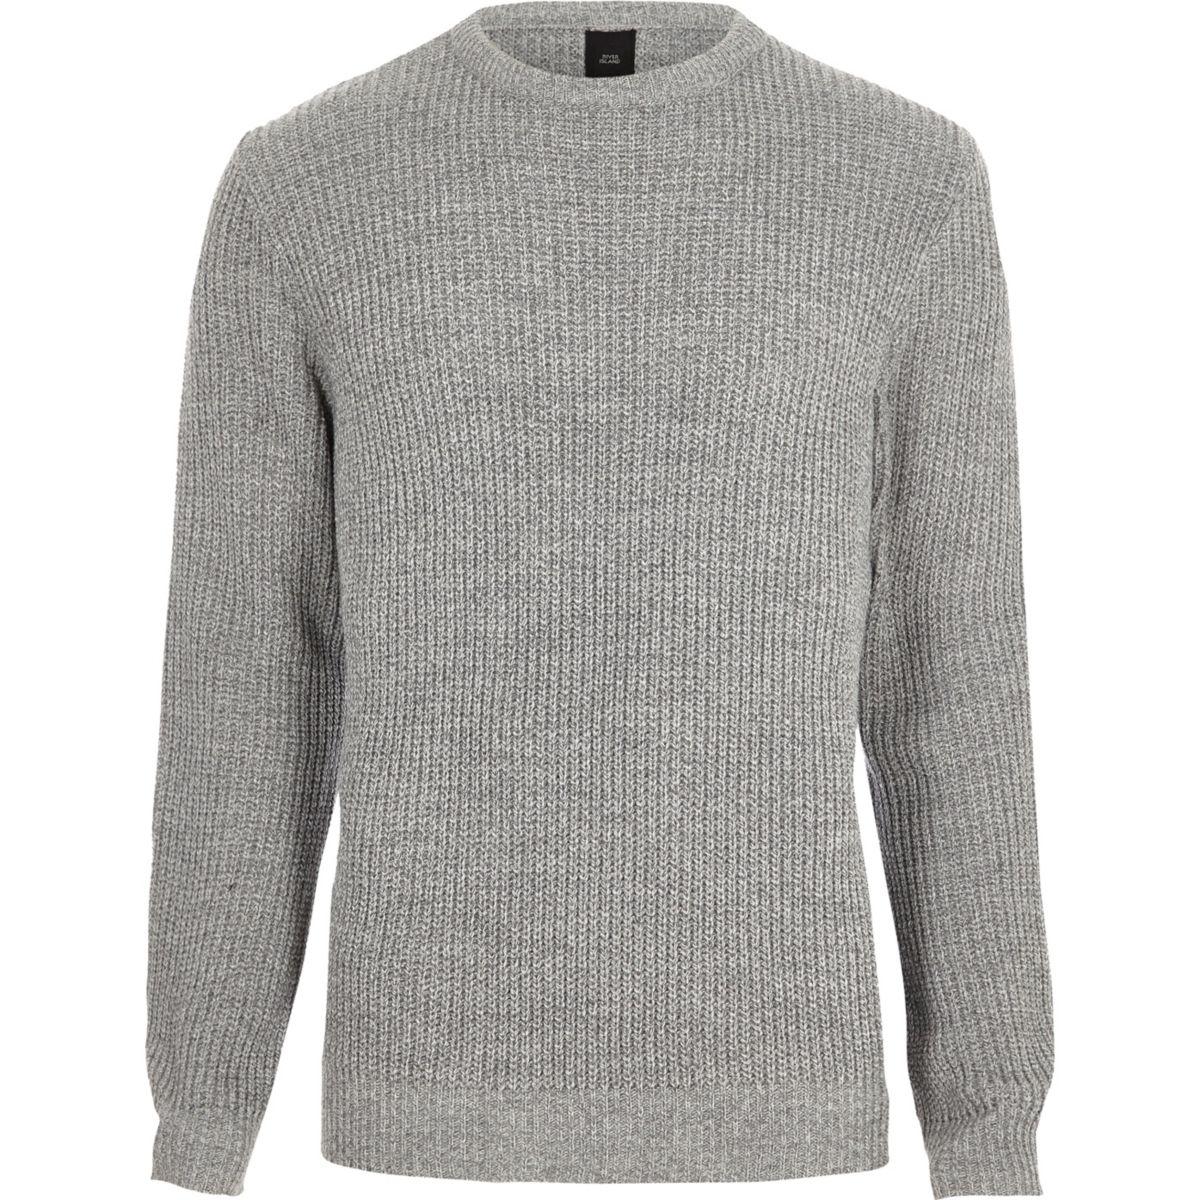 Light grey crew neck fisherman sweater